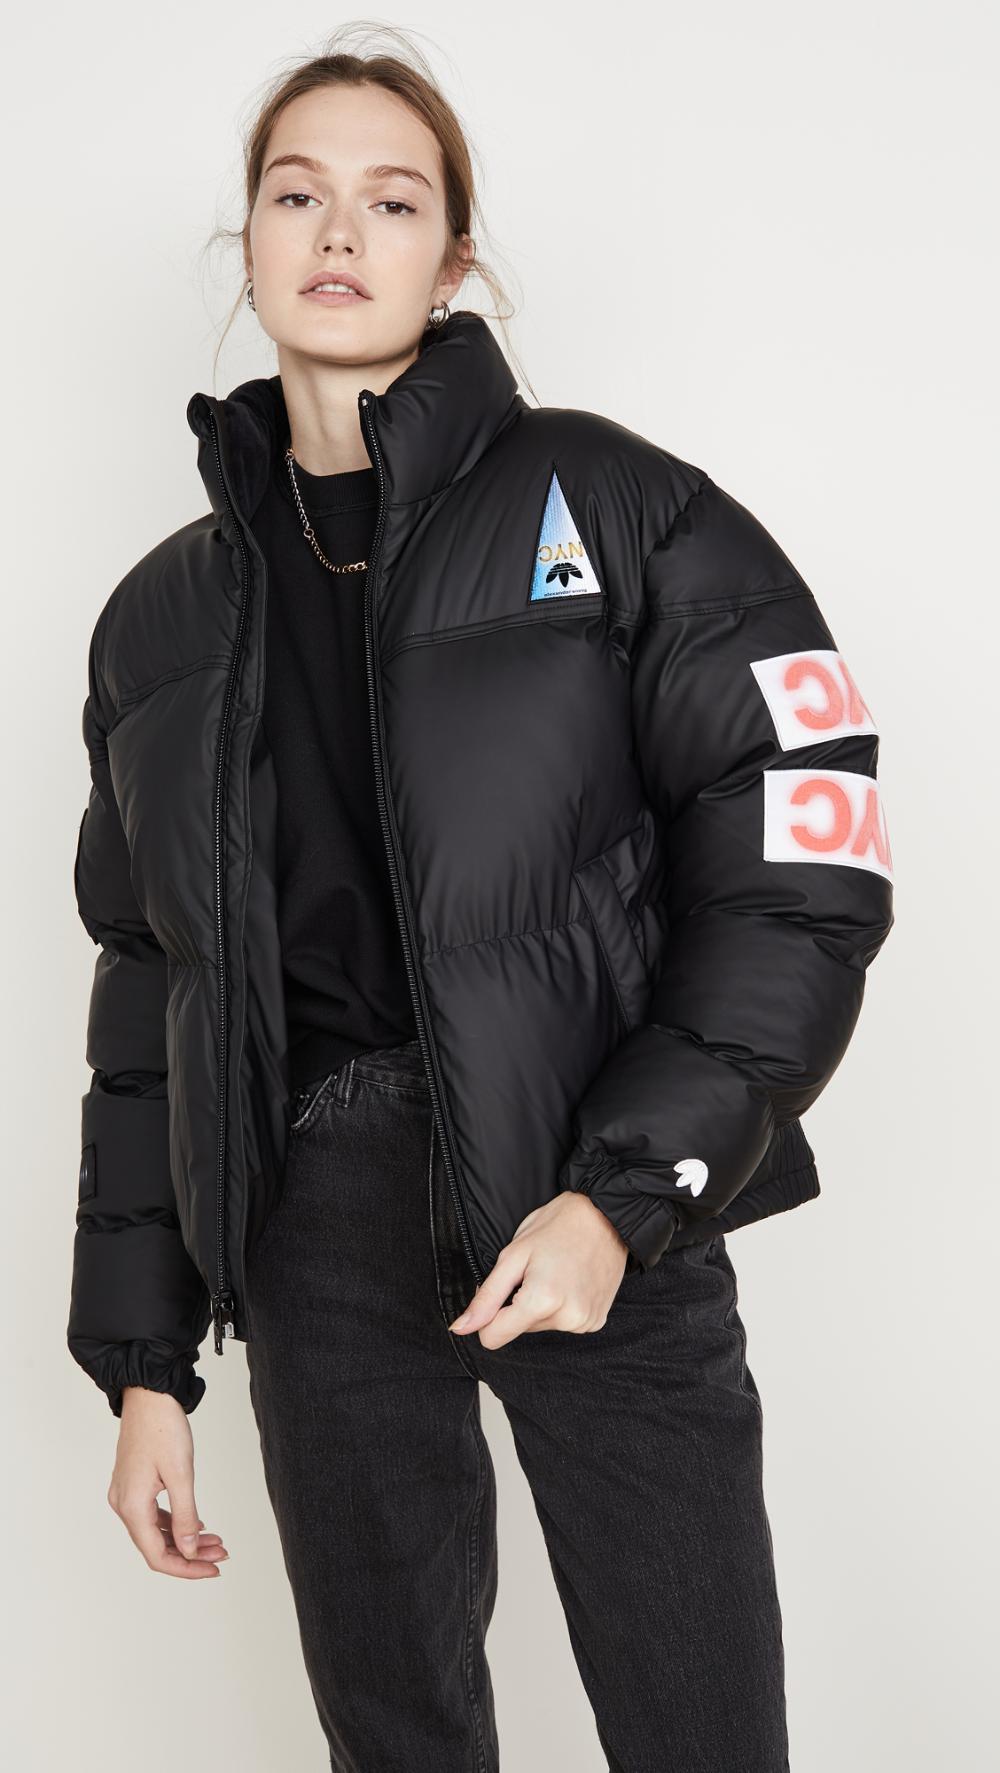 Adidas Originals By Alexander Wang Flex2club Puffer Jacket Fall Fashion Jackets Puffer Jackets Jackets [ 1773 x 1000 Pixel ]